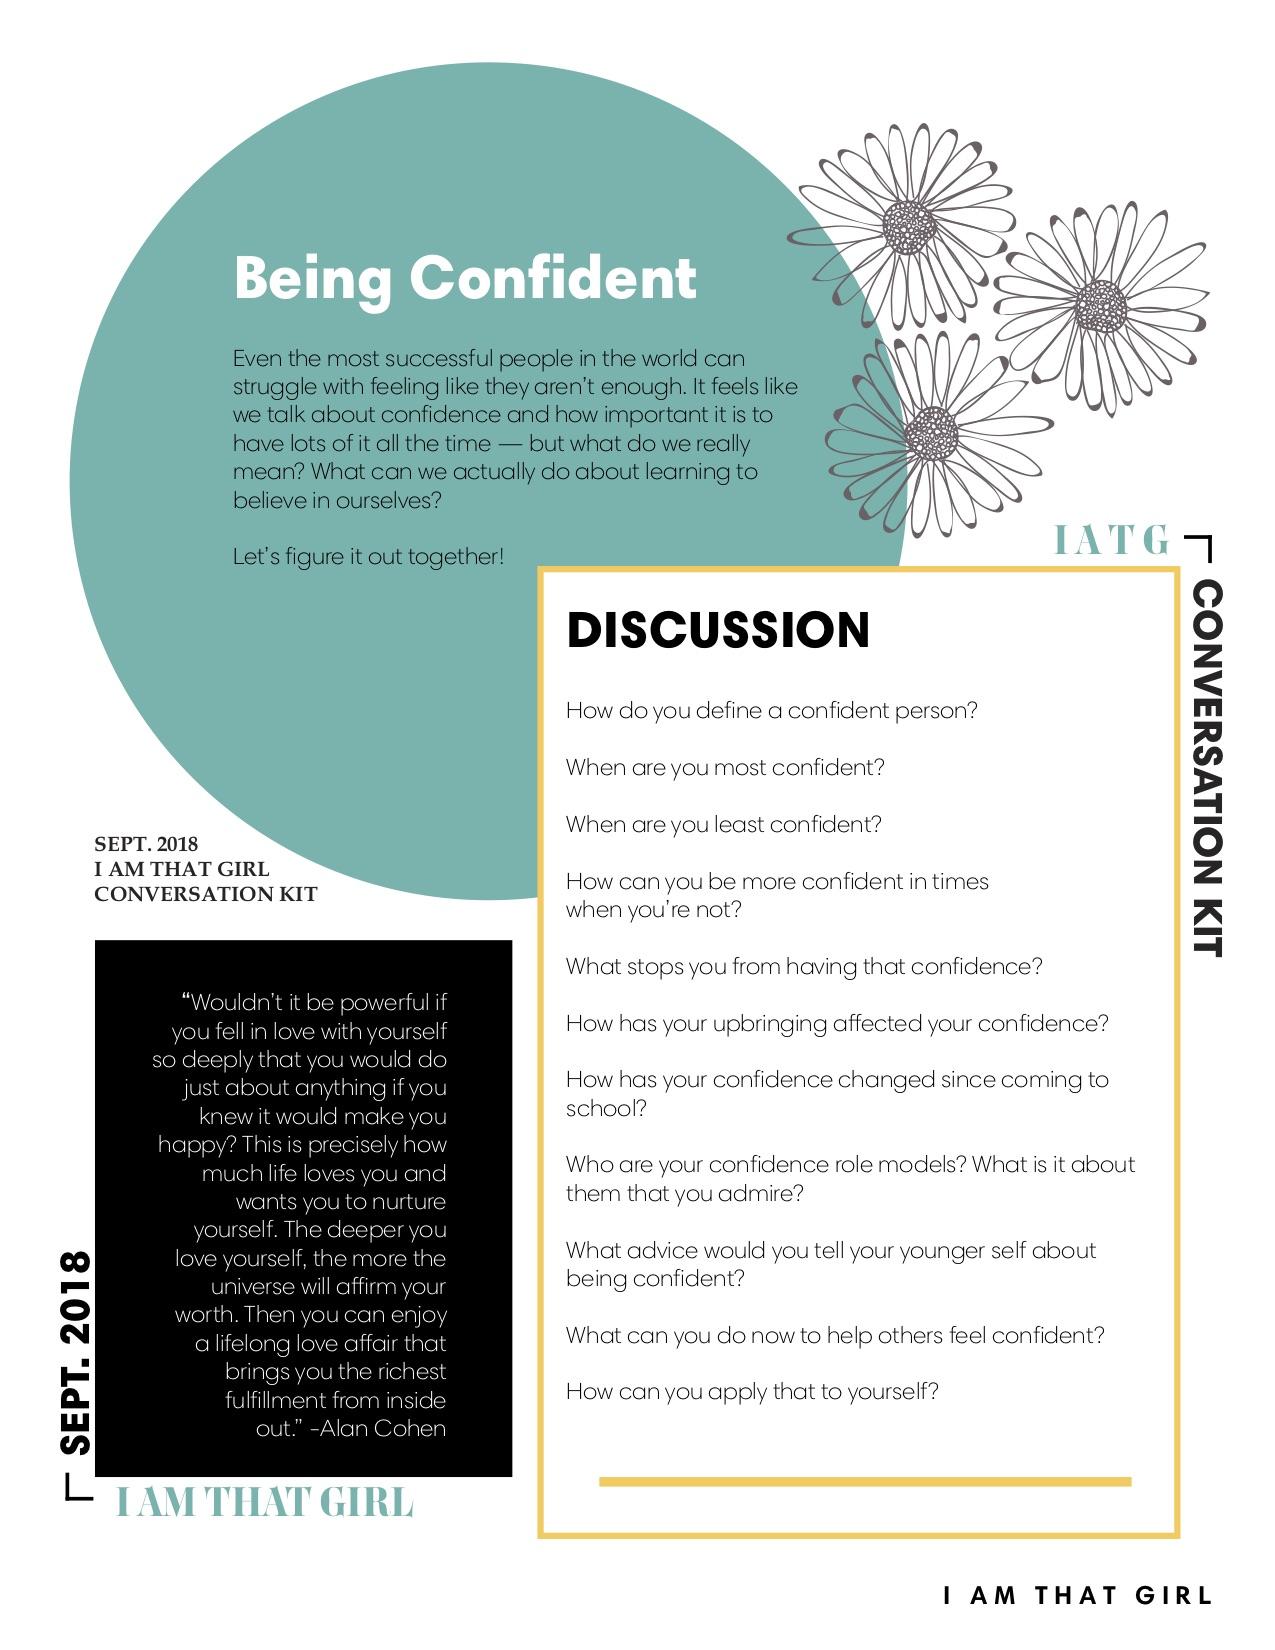 BEING_CONFIDENT_IATG_CONVERSATION_KIT.jpg